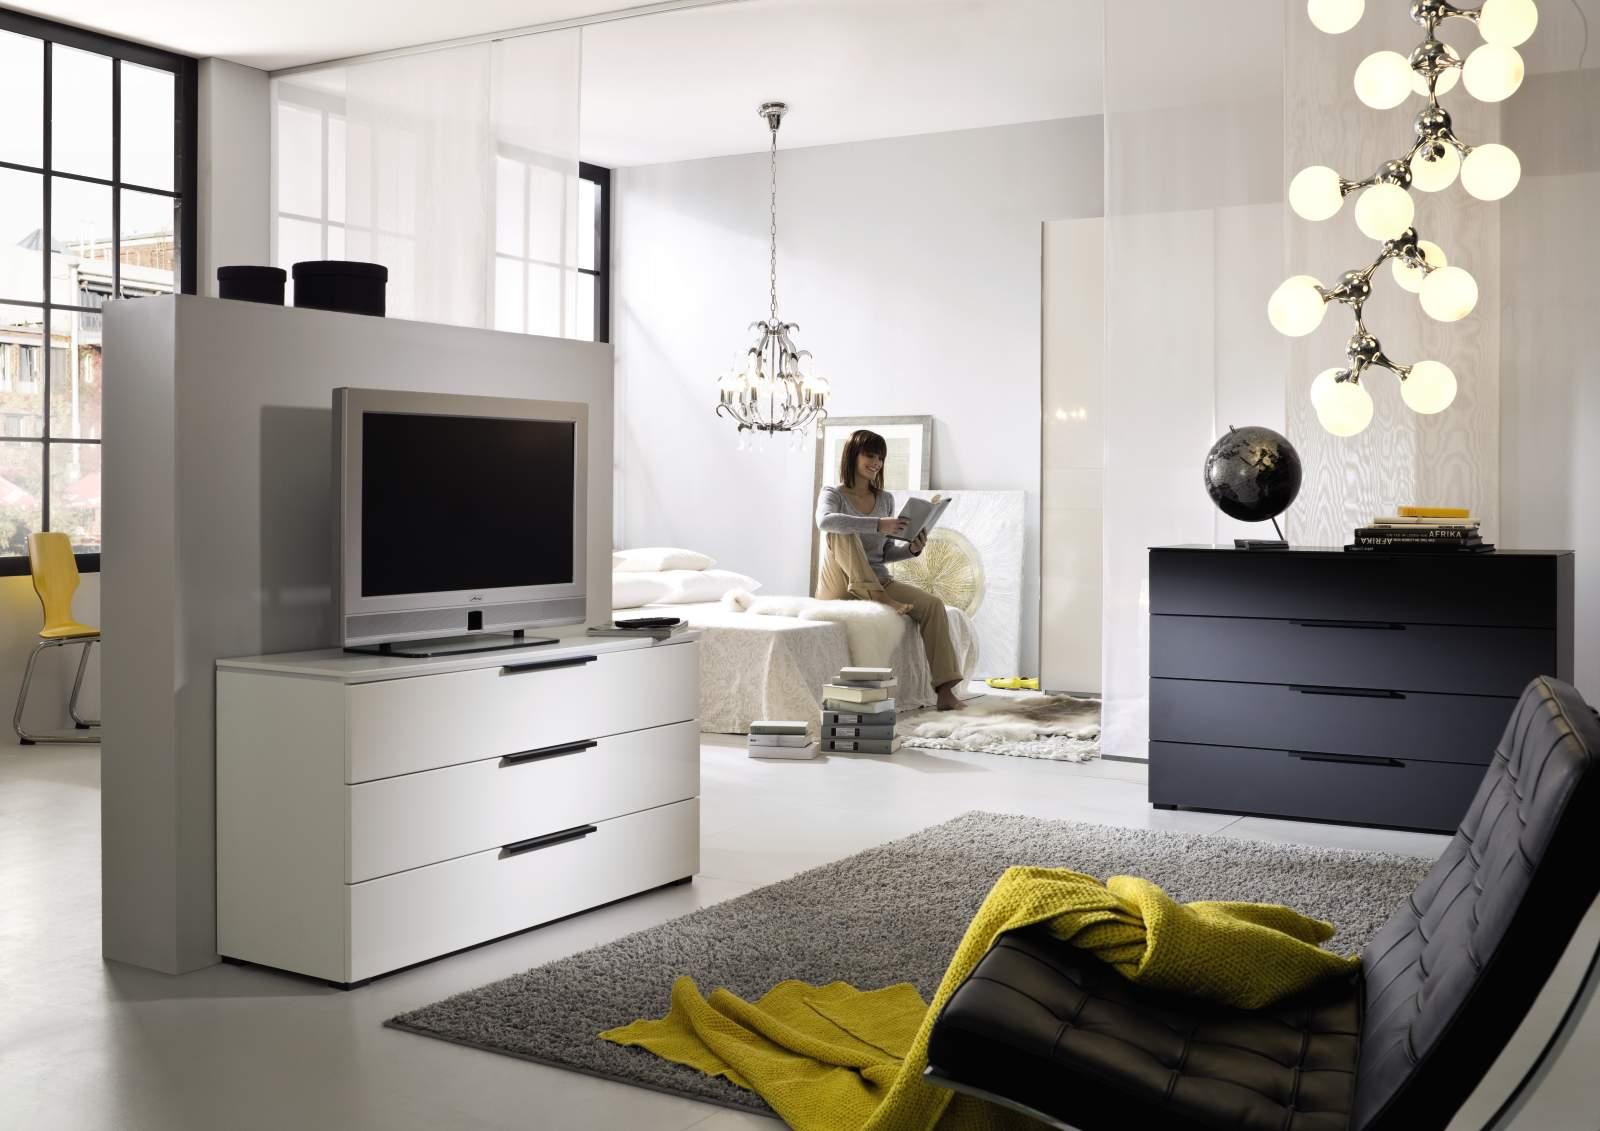 schlafzimmer x markt einsiedler massivm bel polsterm bel gartenm bel. Black Bedroom Furniture Sets. Home Design Ideas